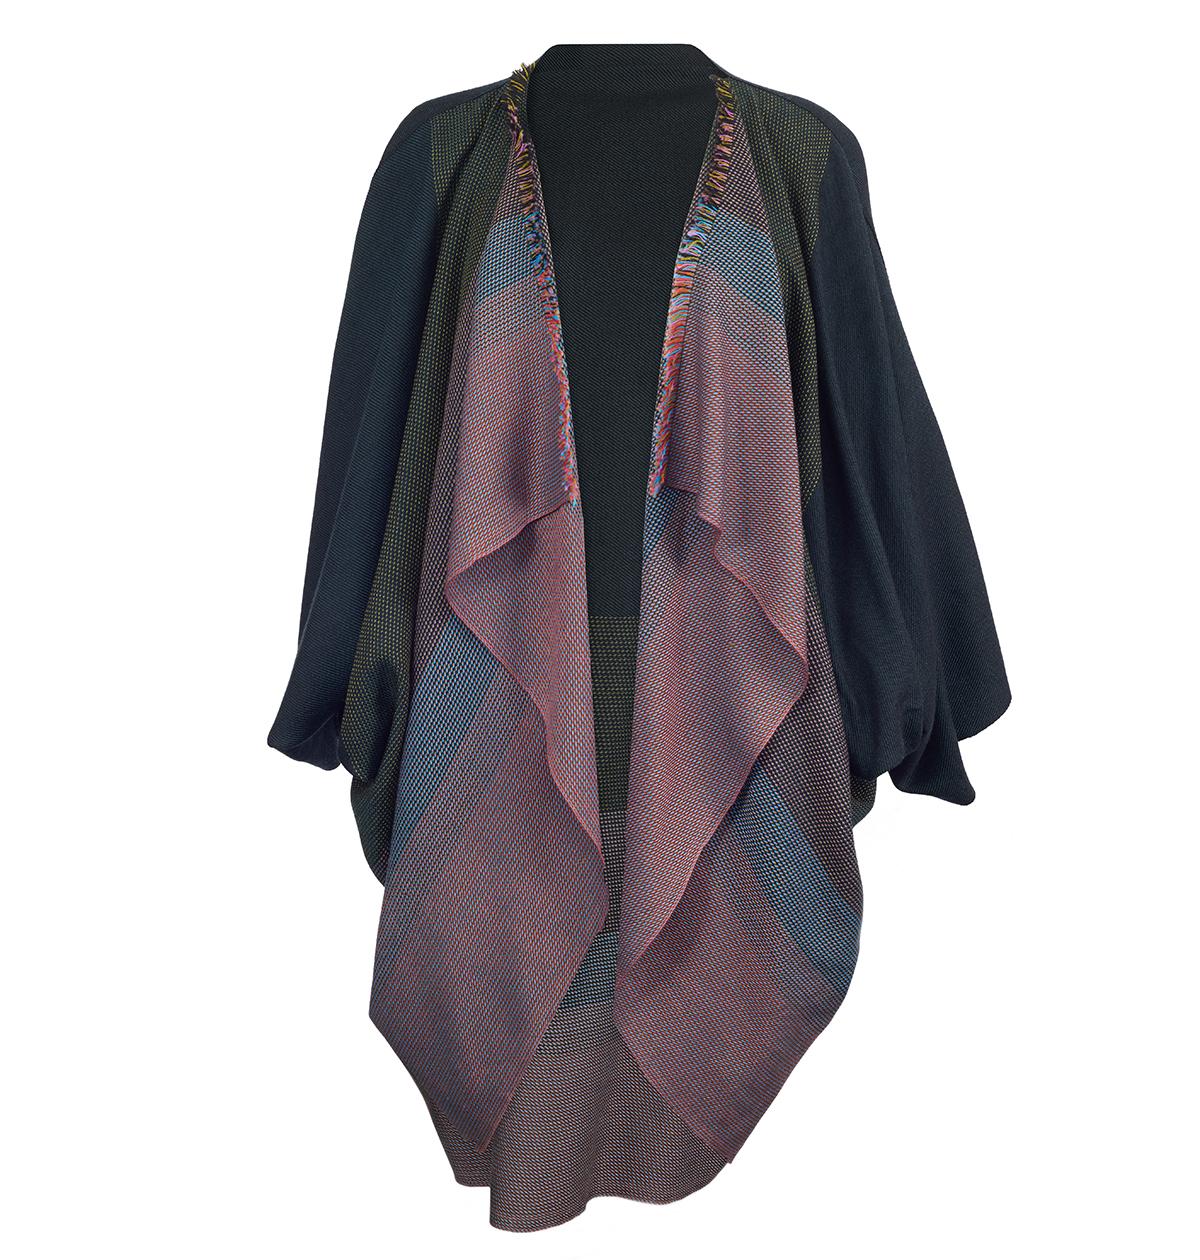 Woven jacket by Brigitte Leclerq